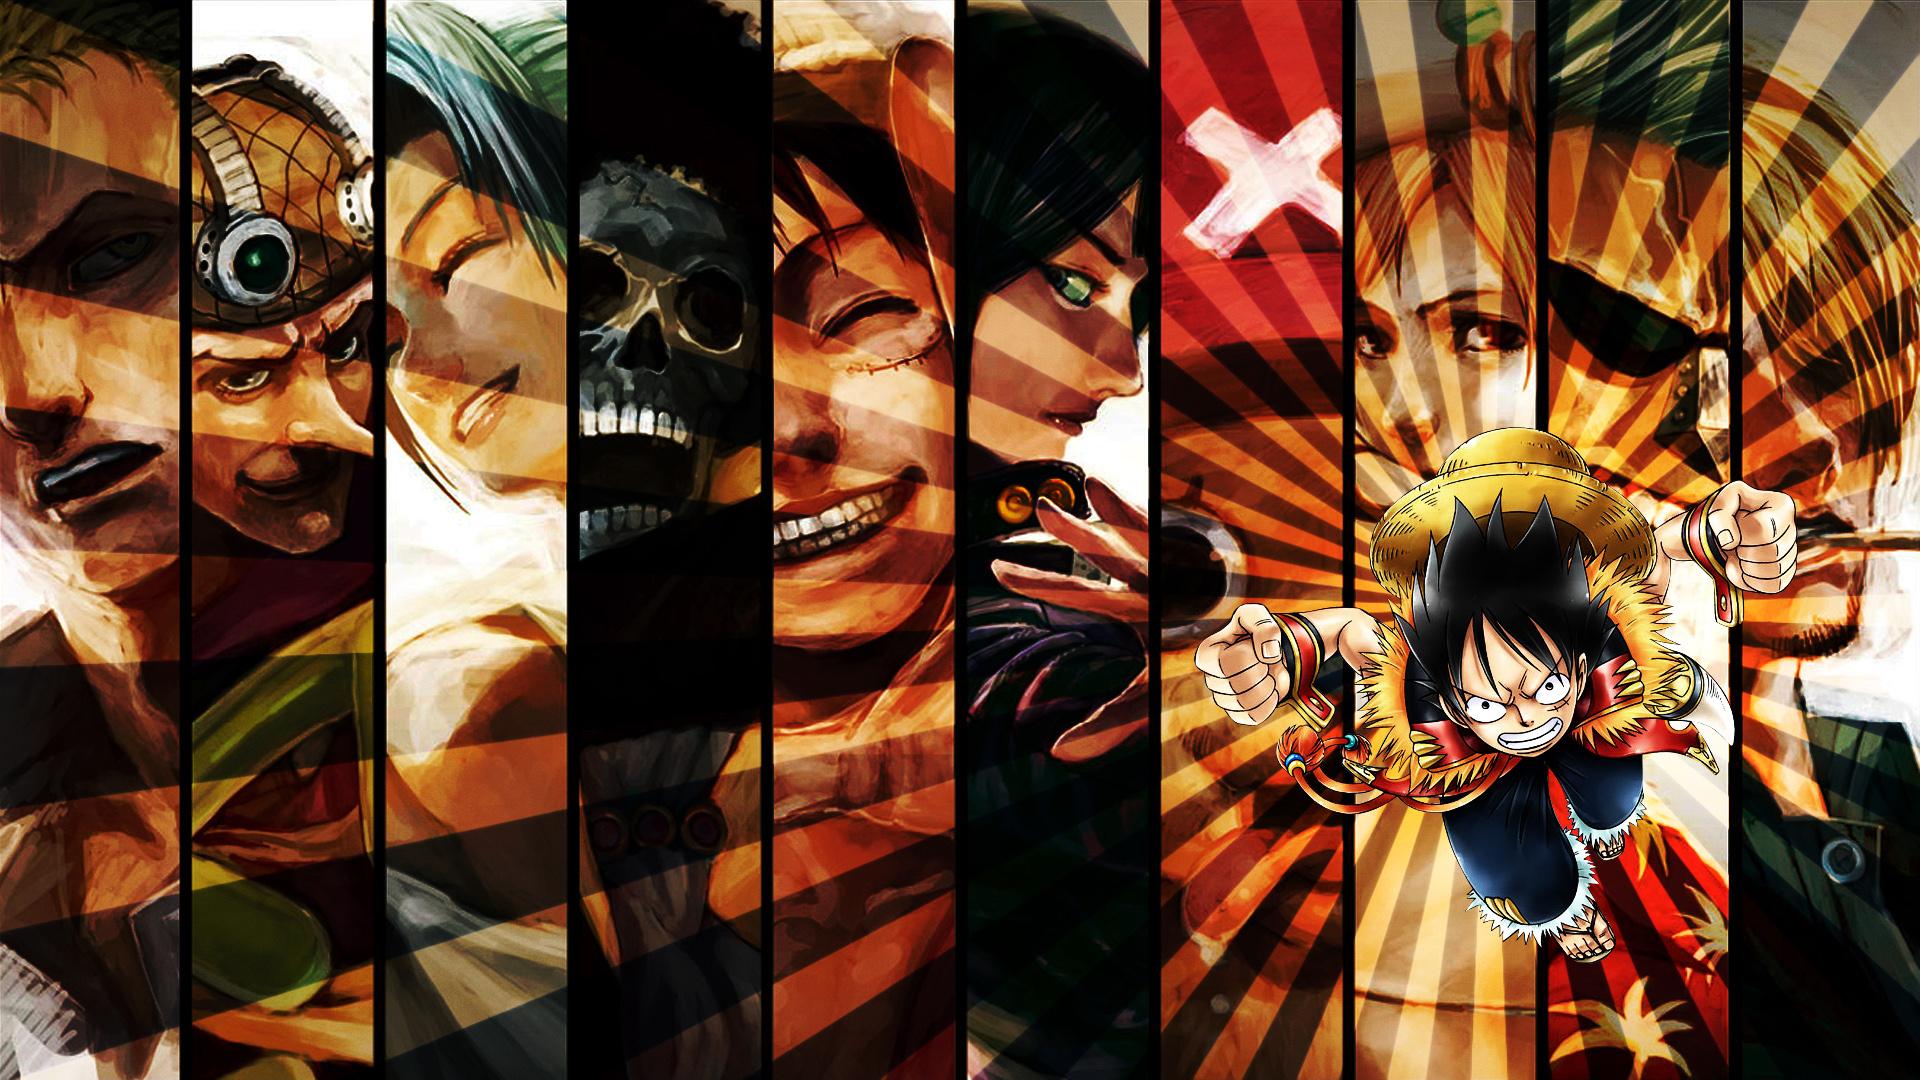 100 Wallpapers de anime HD Anime-one-piece_00181022